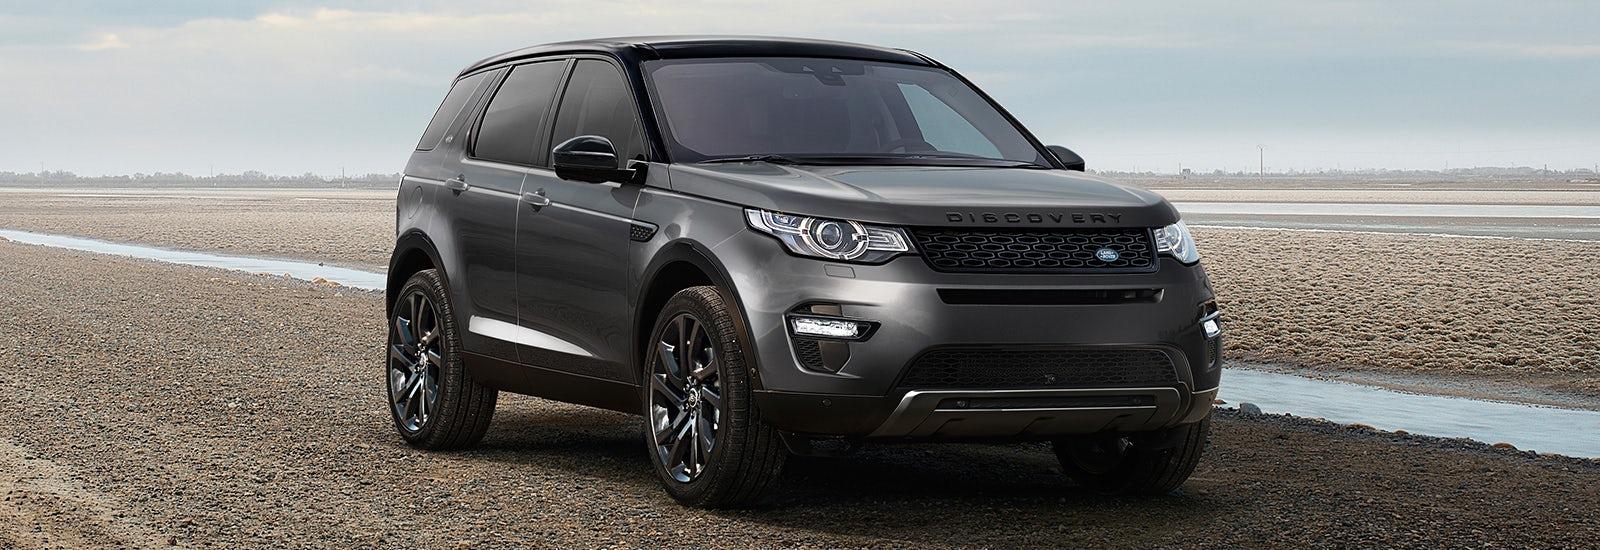 list of 7 seater cars on sale carwow. Black Bedroom Furniture Sets. Home Design Ideas